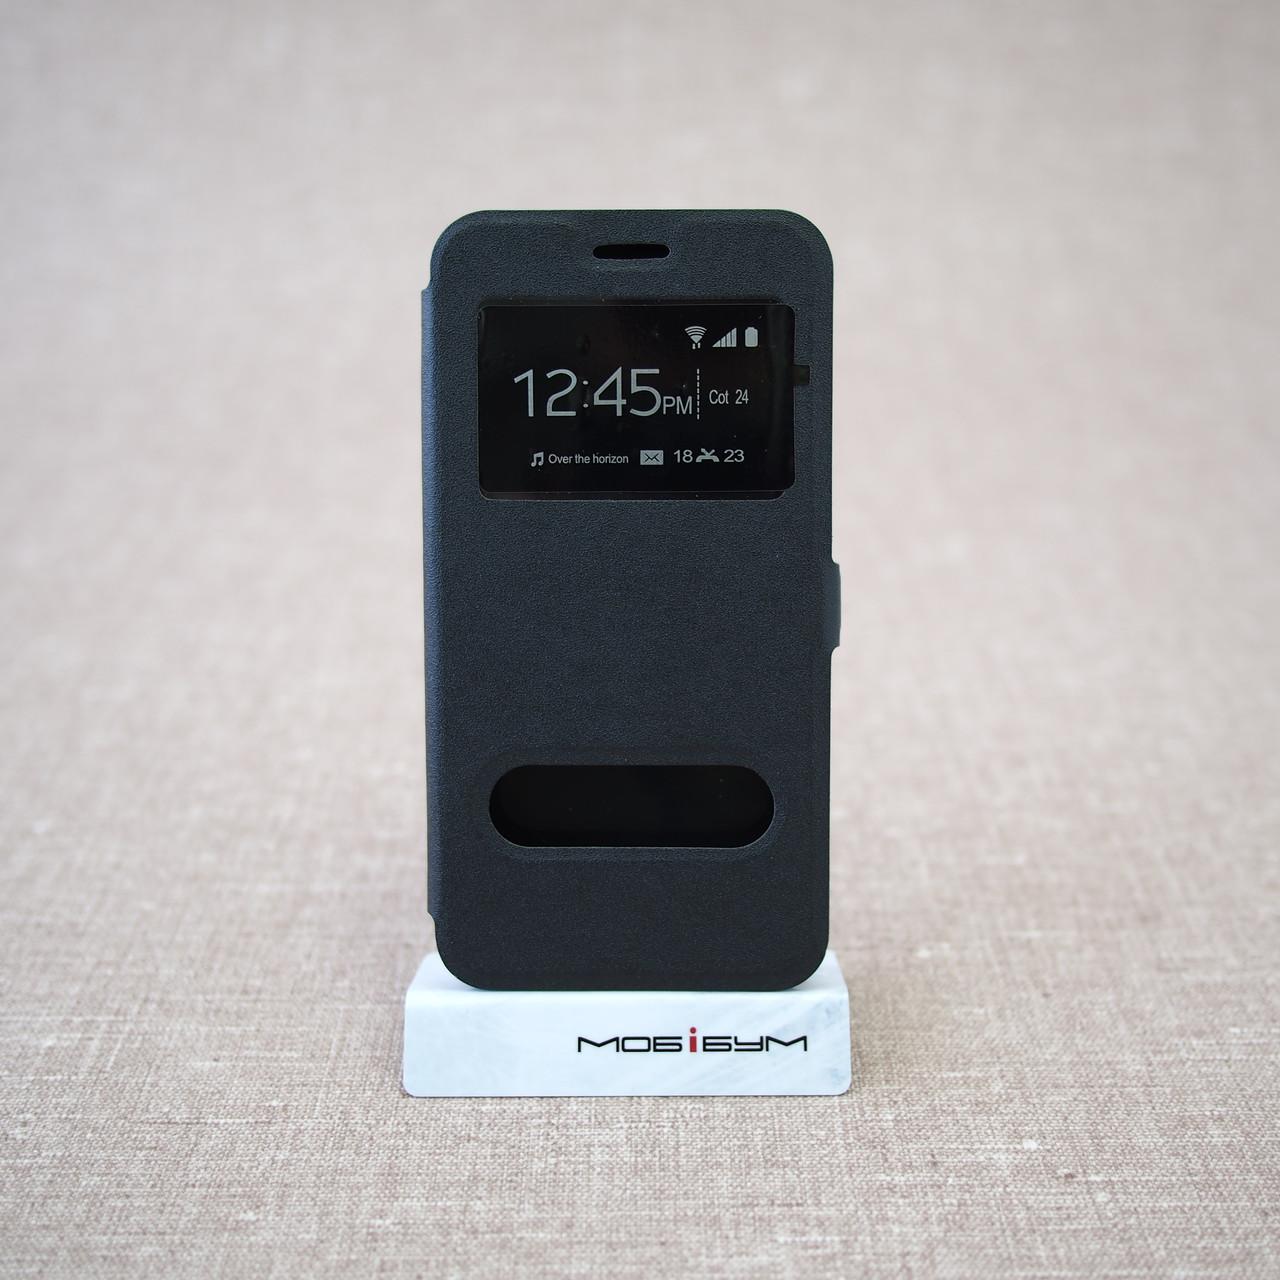 Window Huawei P8 Lite black